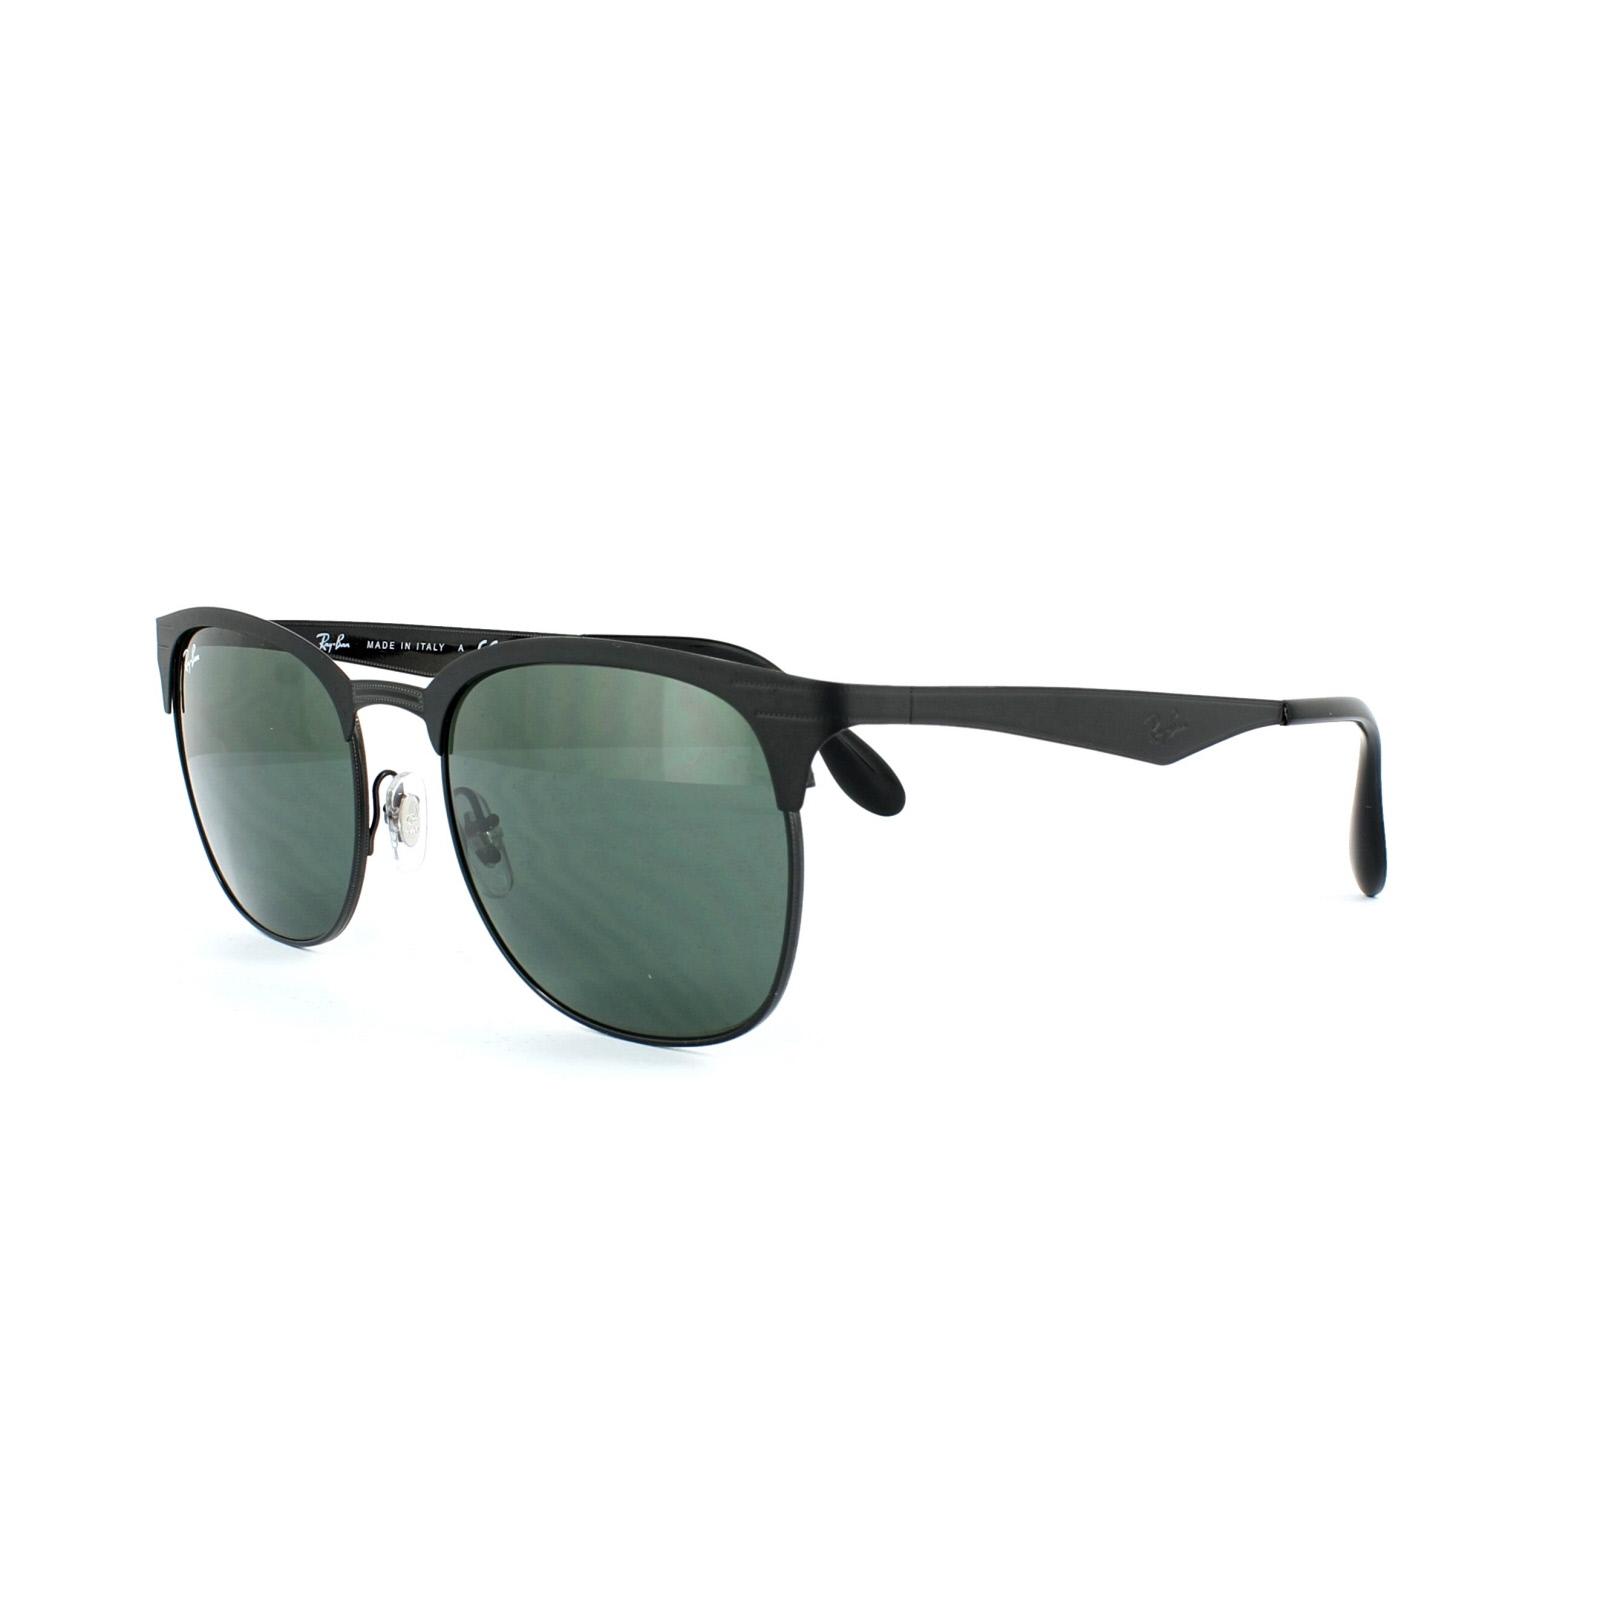 0b2548699c Cheap Ray-Ban 3538 Sunglasses - Discounted Sunglasses